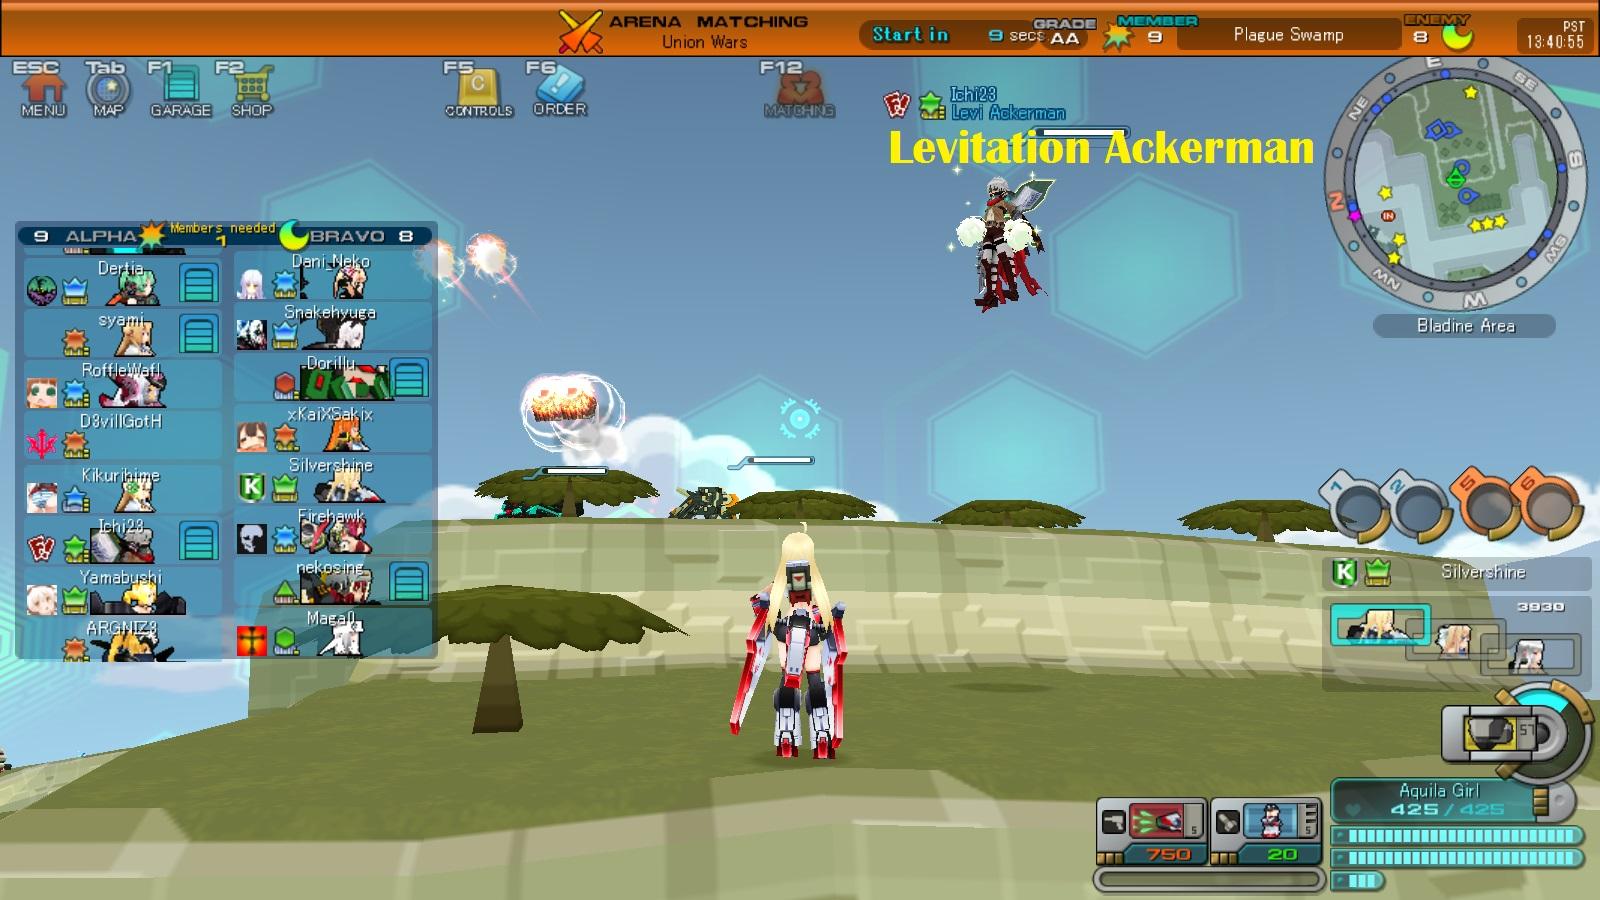 Screenshots in general. 29_levitationackerman_by_nightforest-d9dnjt0